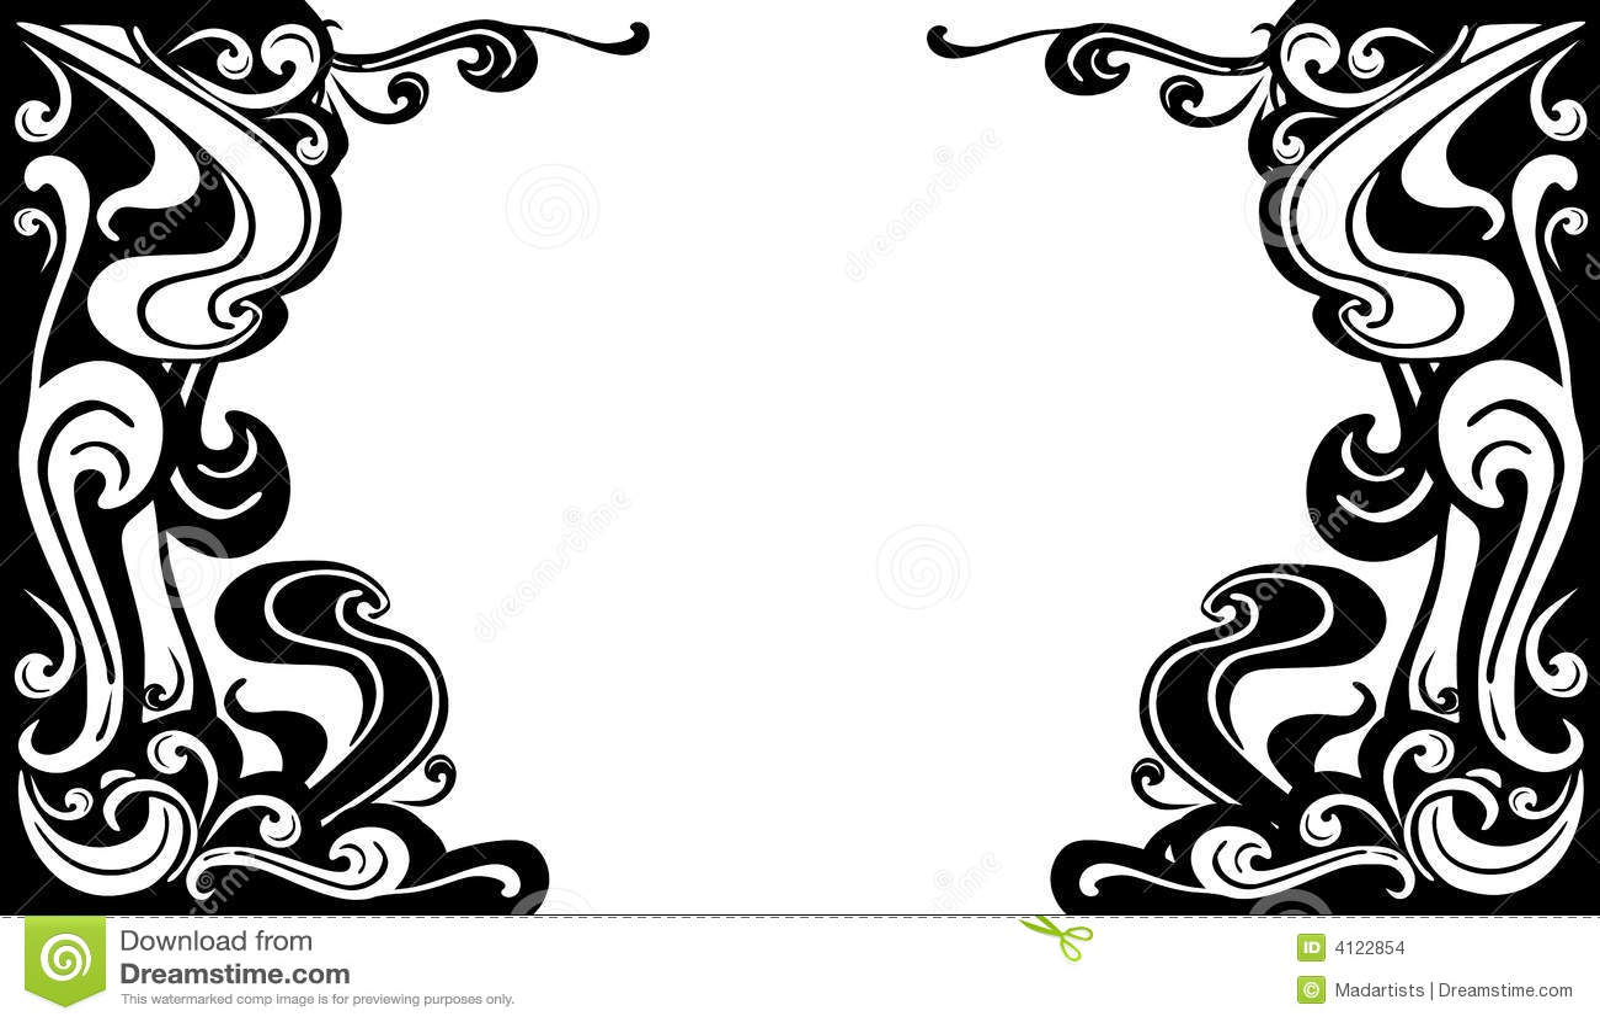 Decorative Black White Flourishes Borders Illustration 4122854